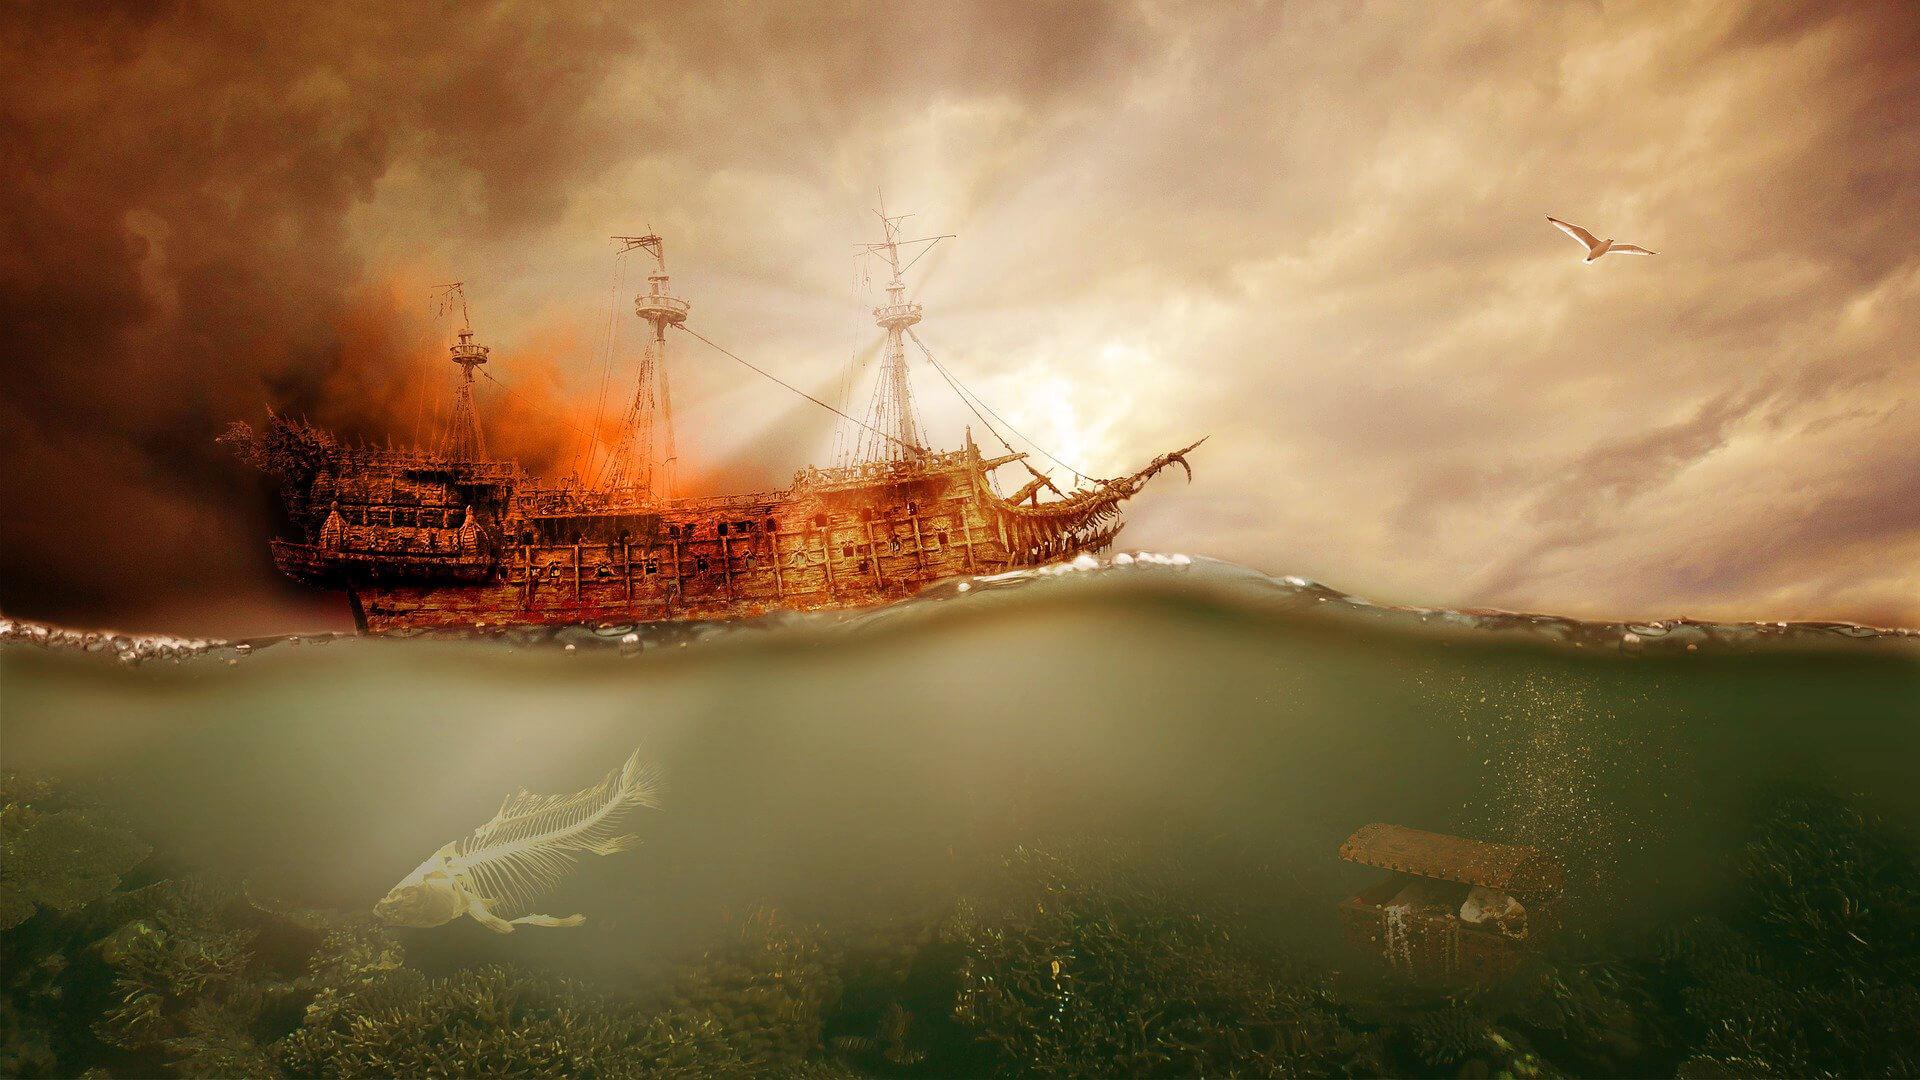 Piraten Geschichten auf Meer